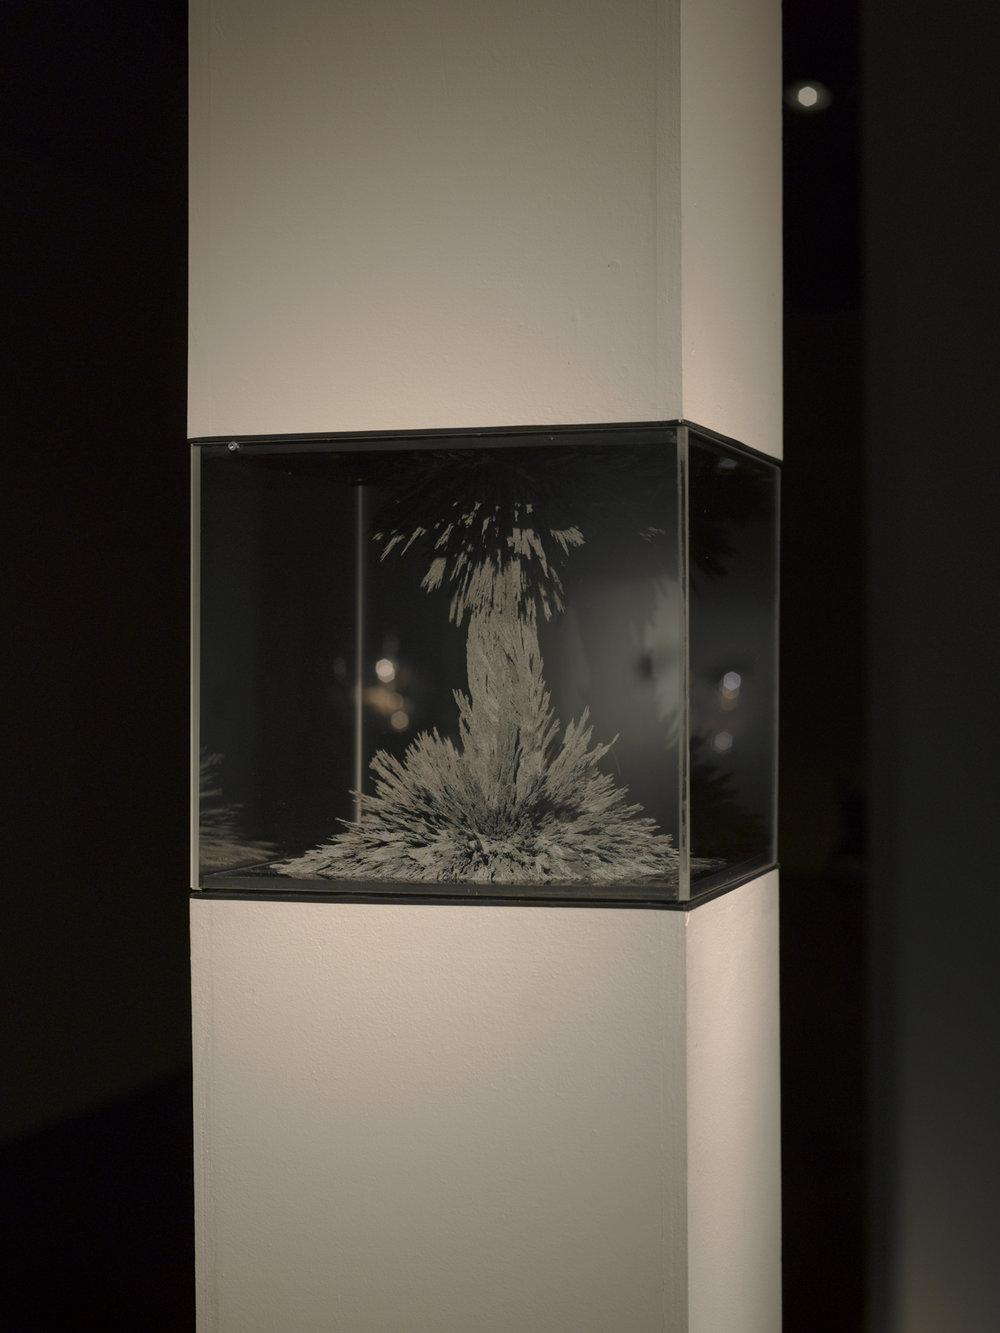 Maquette pour colosse, 2011